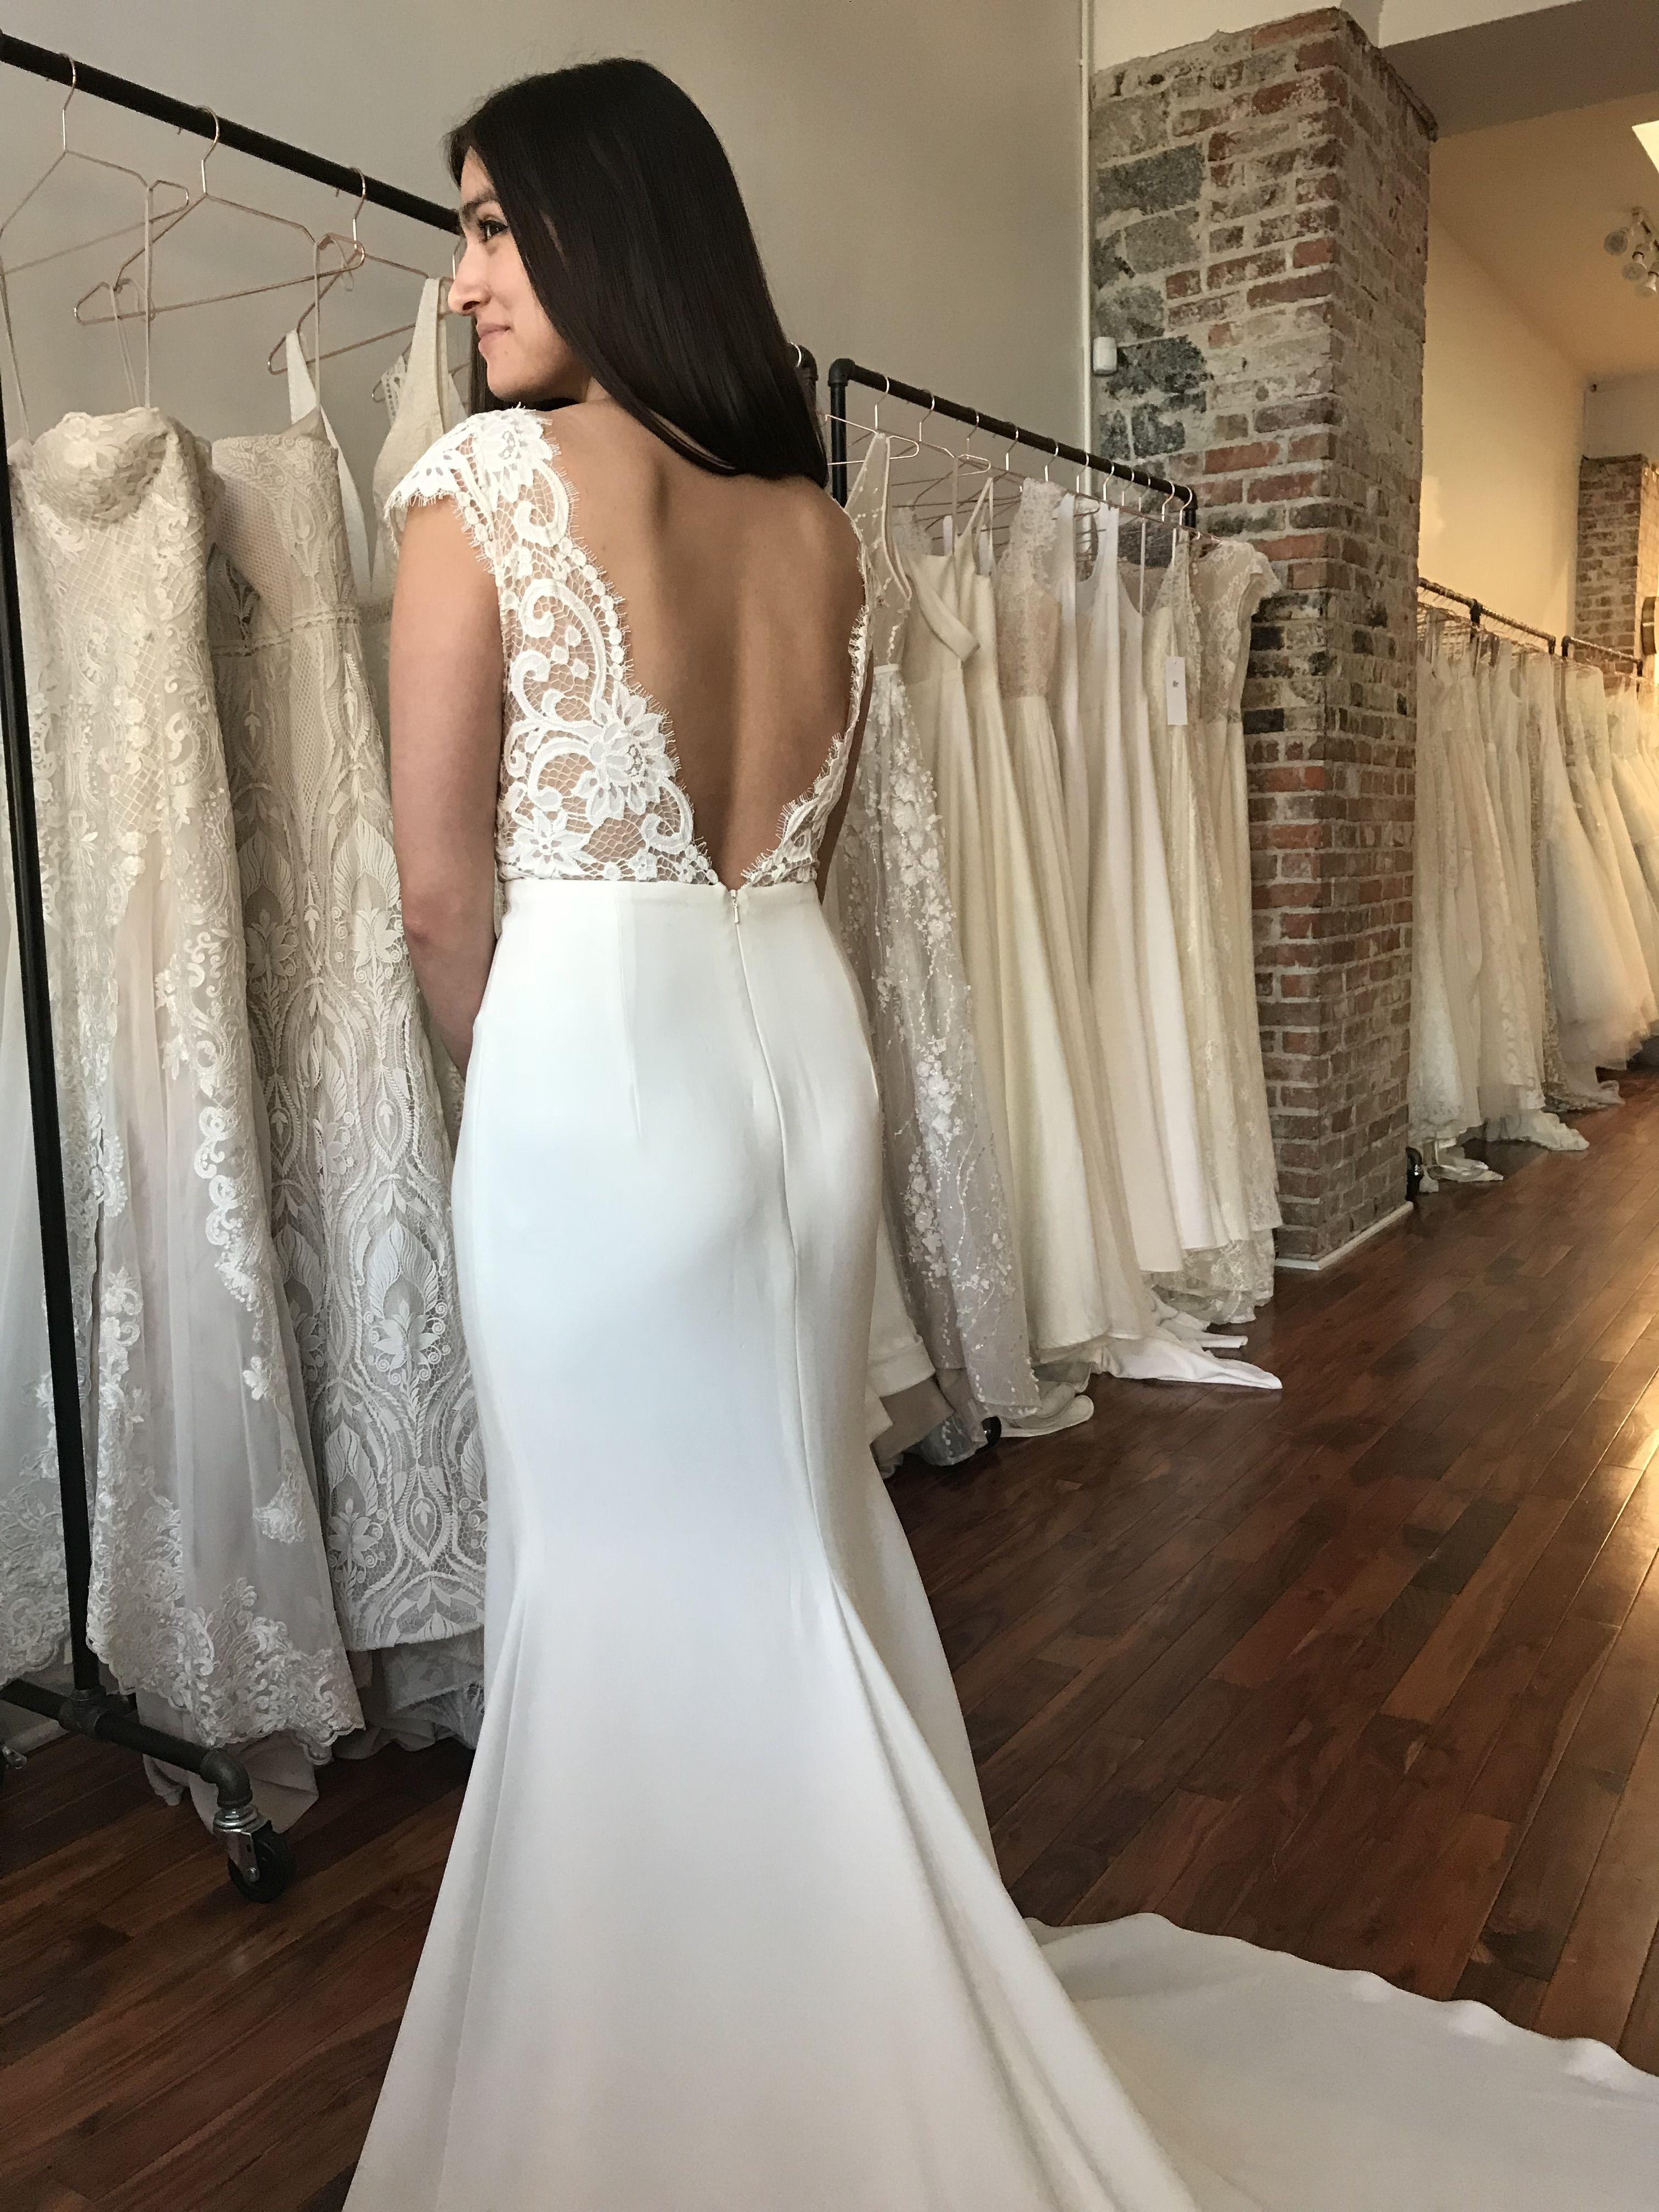 Annalise By Anais Anette 2019 Wedding Dresses Modern Wedding Dresses Fitted Lace Wed Wedding Dresses Short Sleeve Wedding Dress Fitted Lace Wedding Dress [ 4032 x 3024 Pixel ]